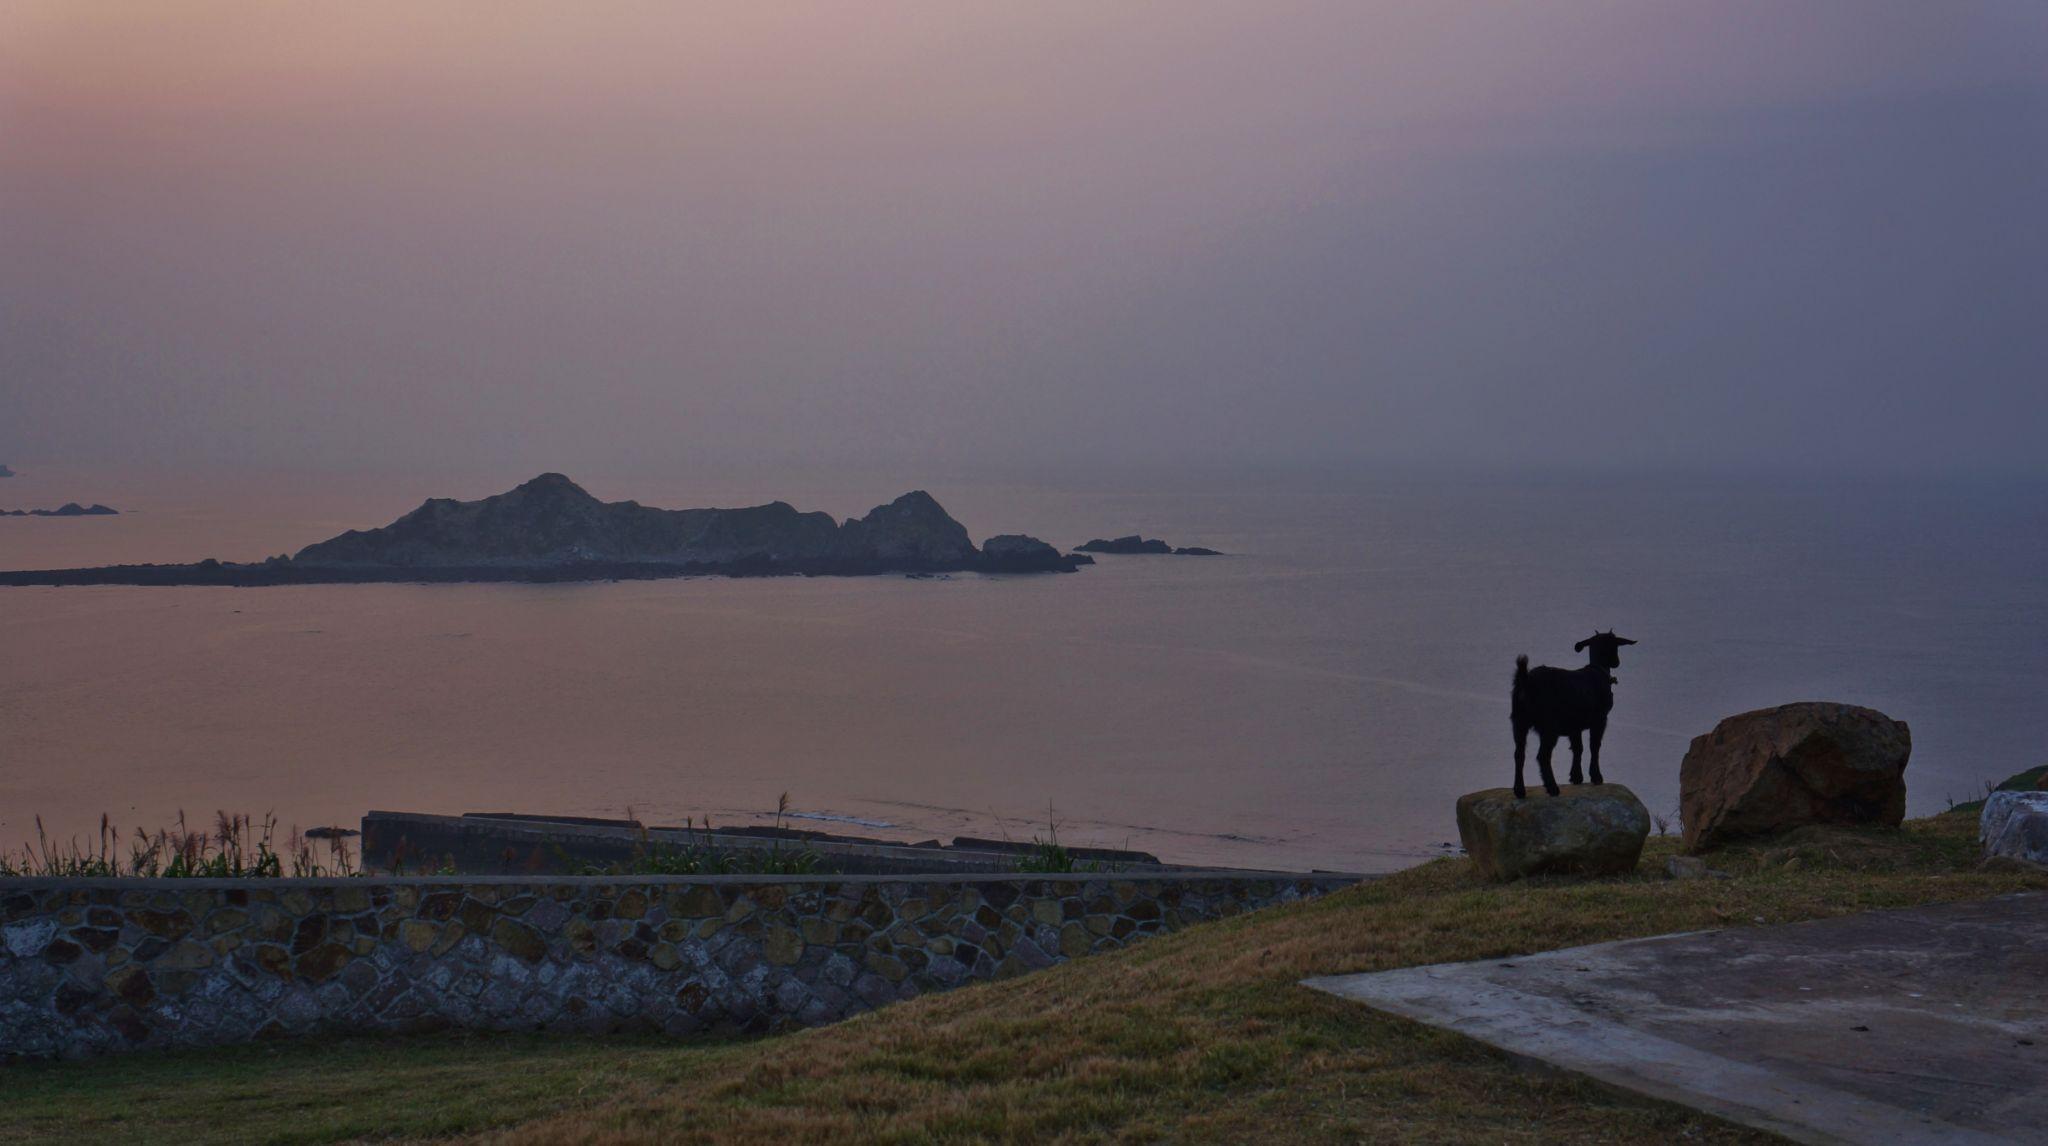 Enjoying Sunset on DongJu 東莒 Island, Taiwan by yunpunghsu